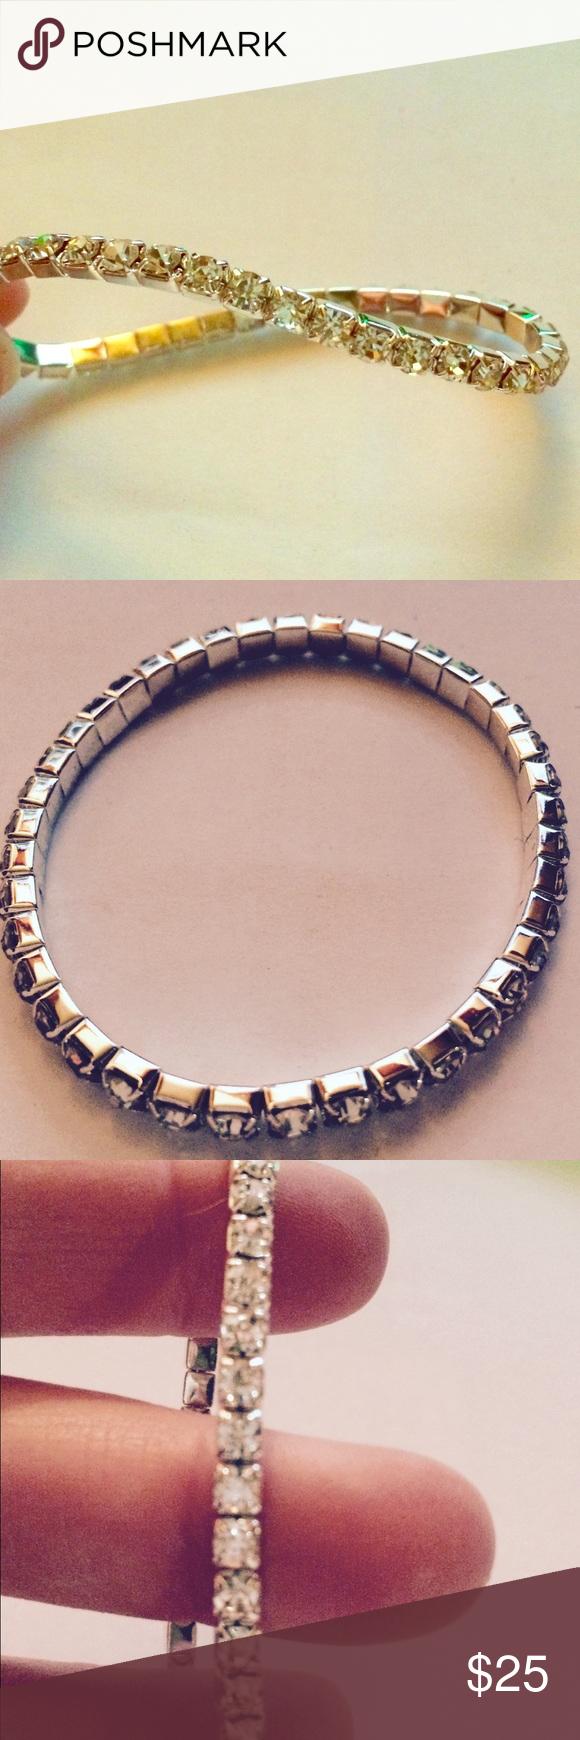 "6"" Swarovski elements stretch bracelet. Brand new 6"" stretch bracelet with Swarovski elements Jewelry Bracelets"